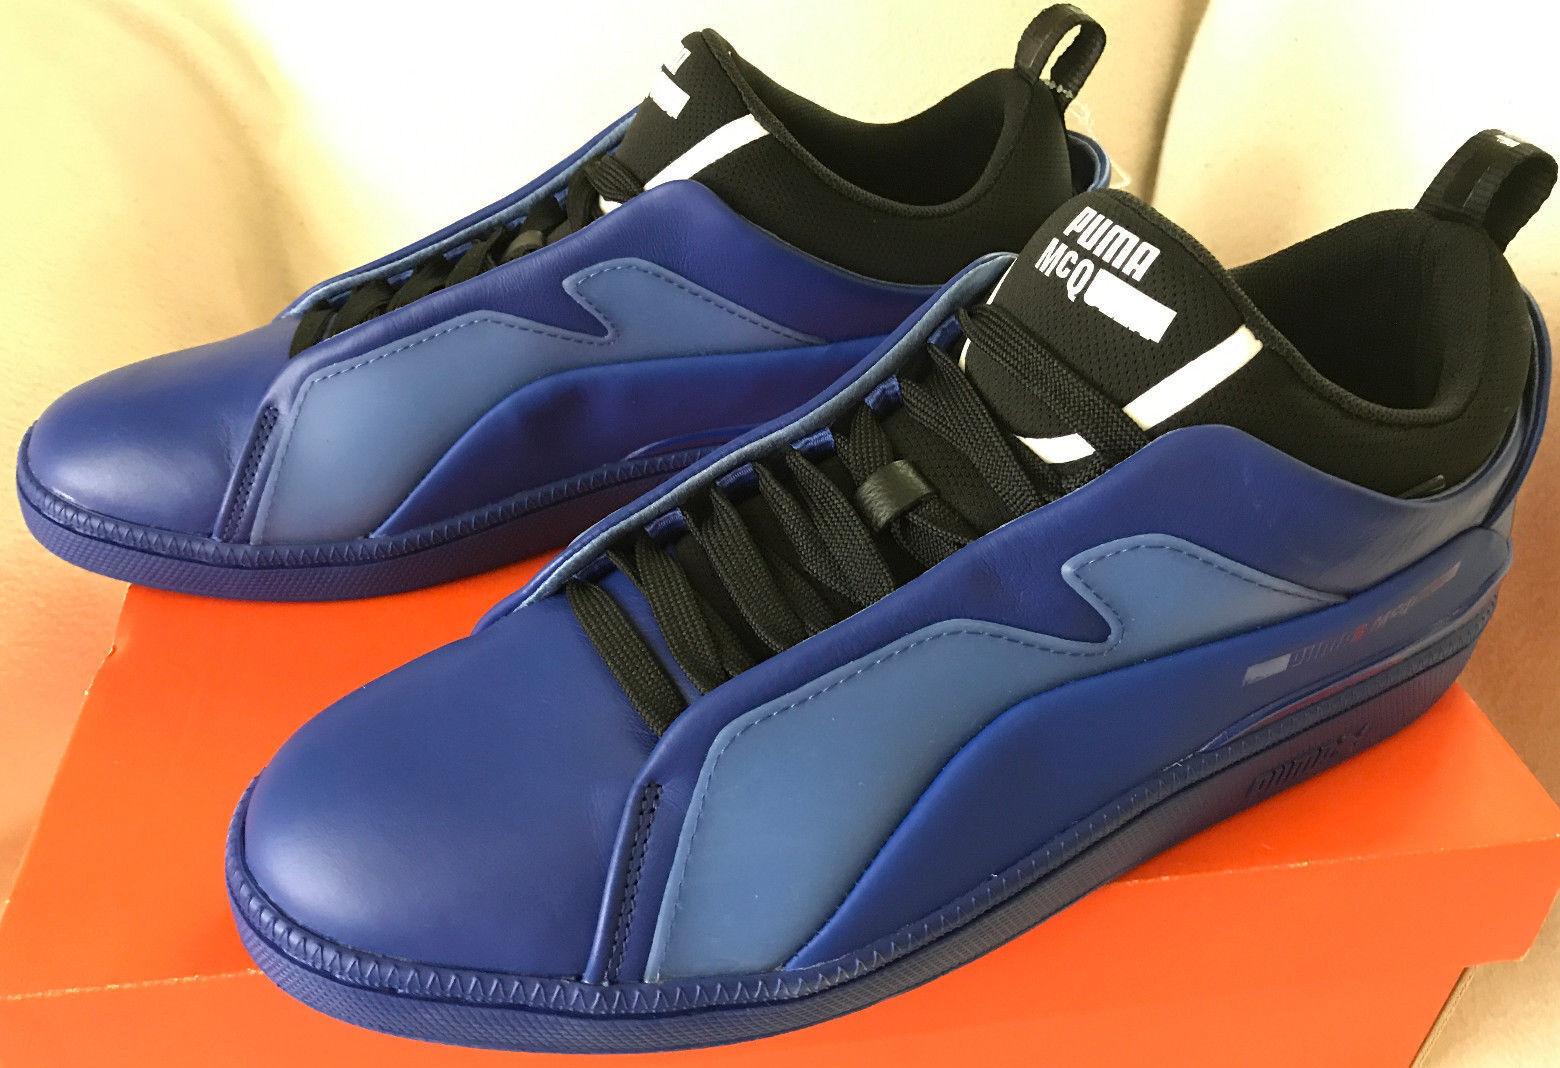 PUMA MCQ Brace Lo 361319-02 Alexander McQueen Surf Black bluee shoes Men's 9 New